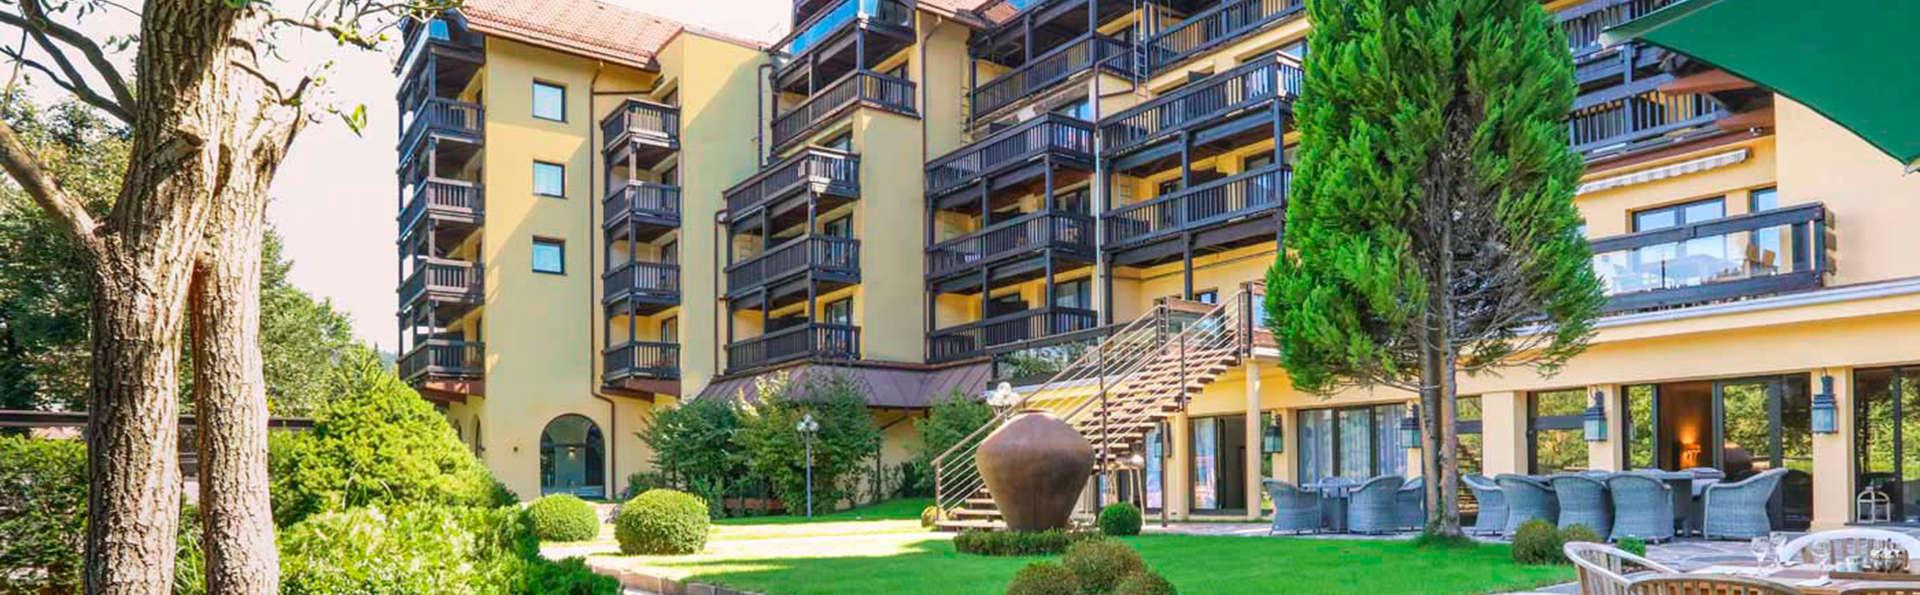 Parkhotel Luise Bad Herrenalb - EDIT_NEW_front.jpg